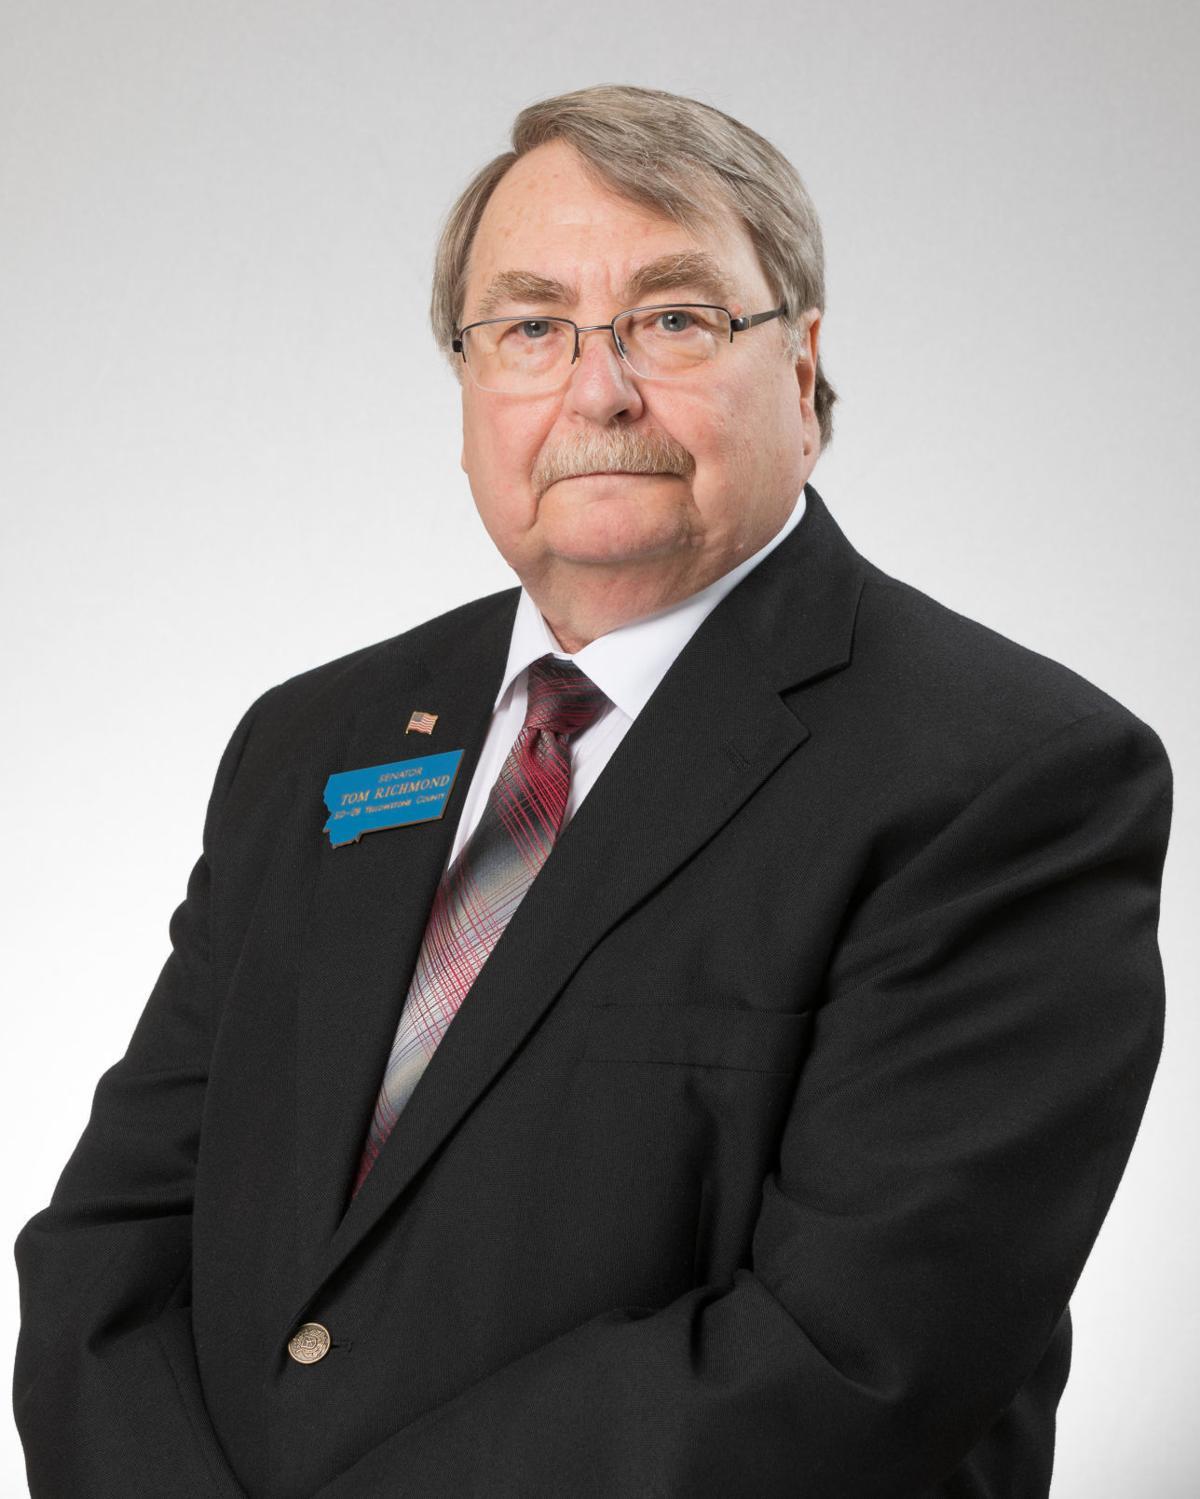 Sen. Tom Richmond (R-Billings)